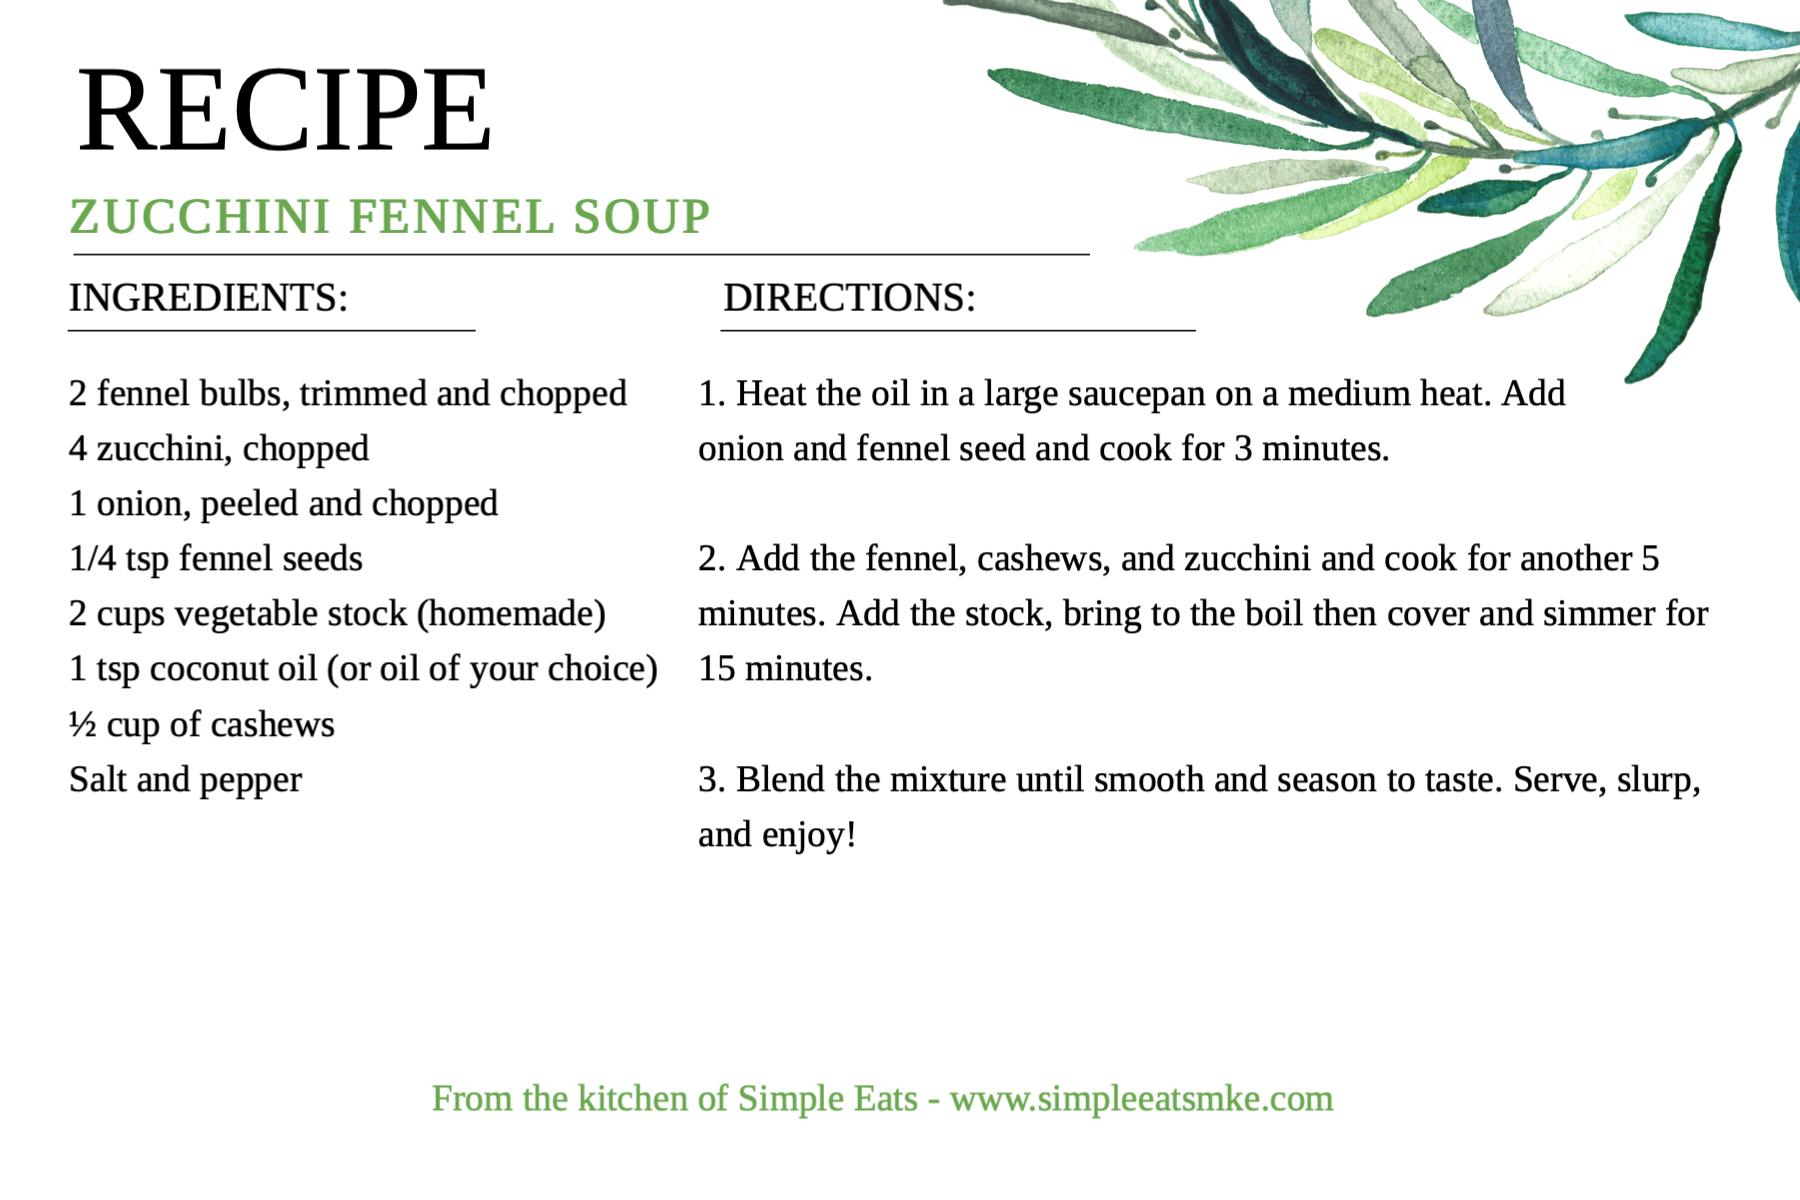 11_17 Zucchini Fennel Soup.jpeg